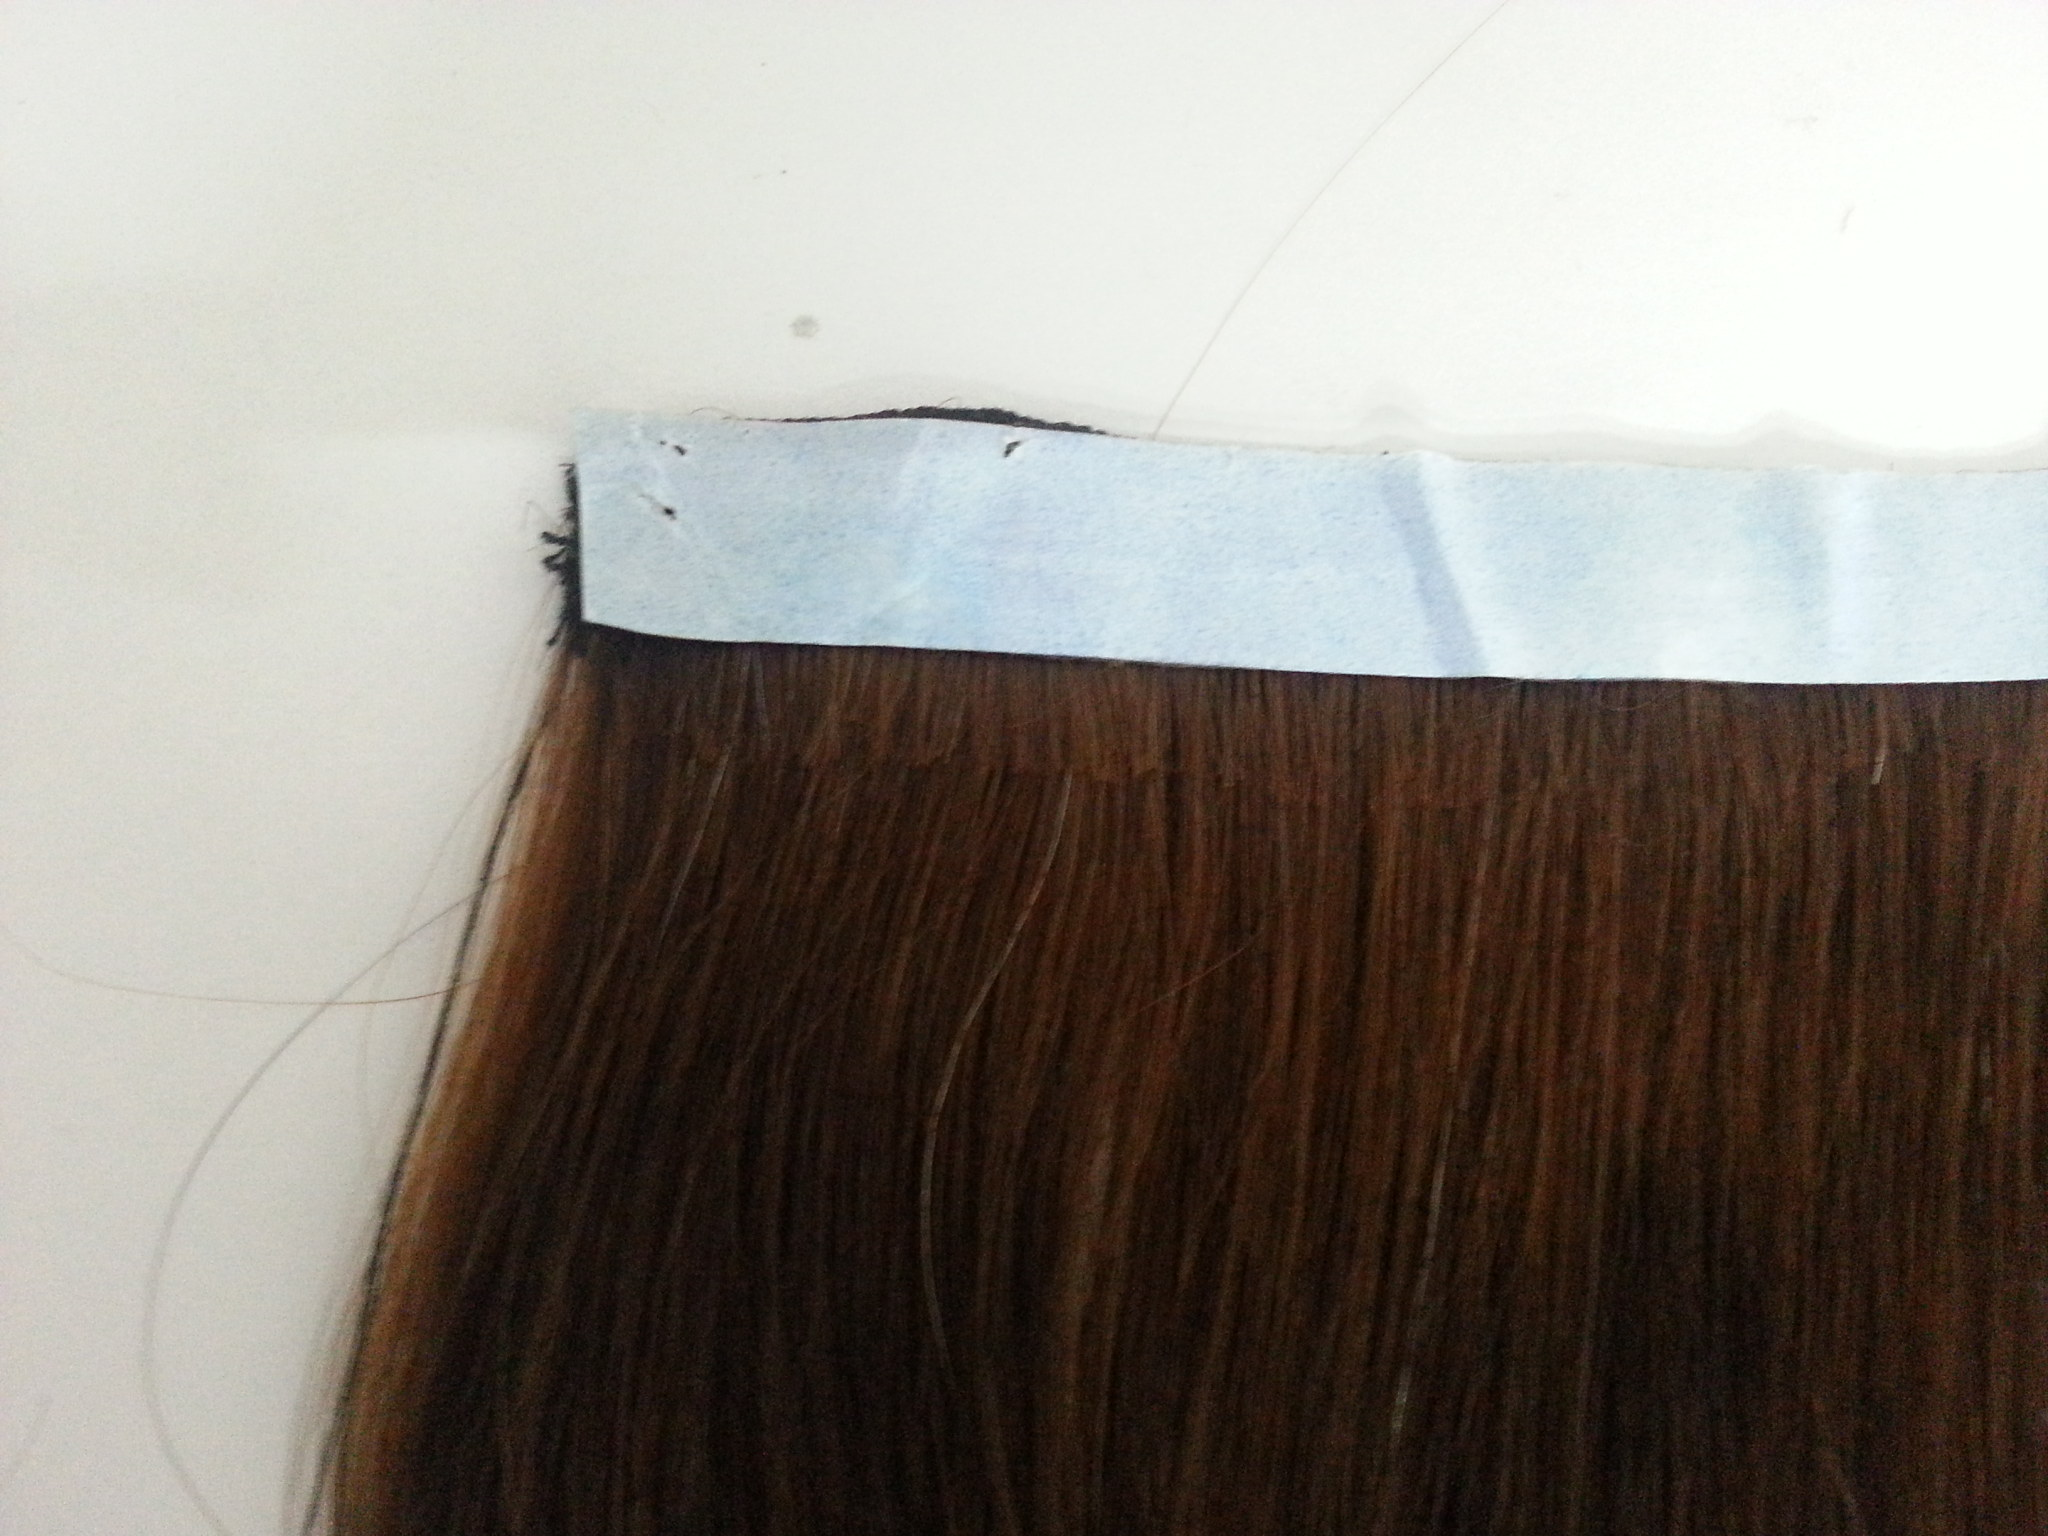 Fita adesiva dupla face Lace Front transparente 2,7m